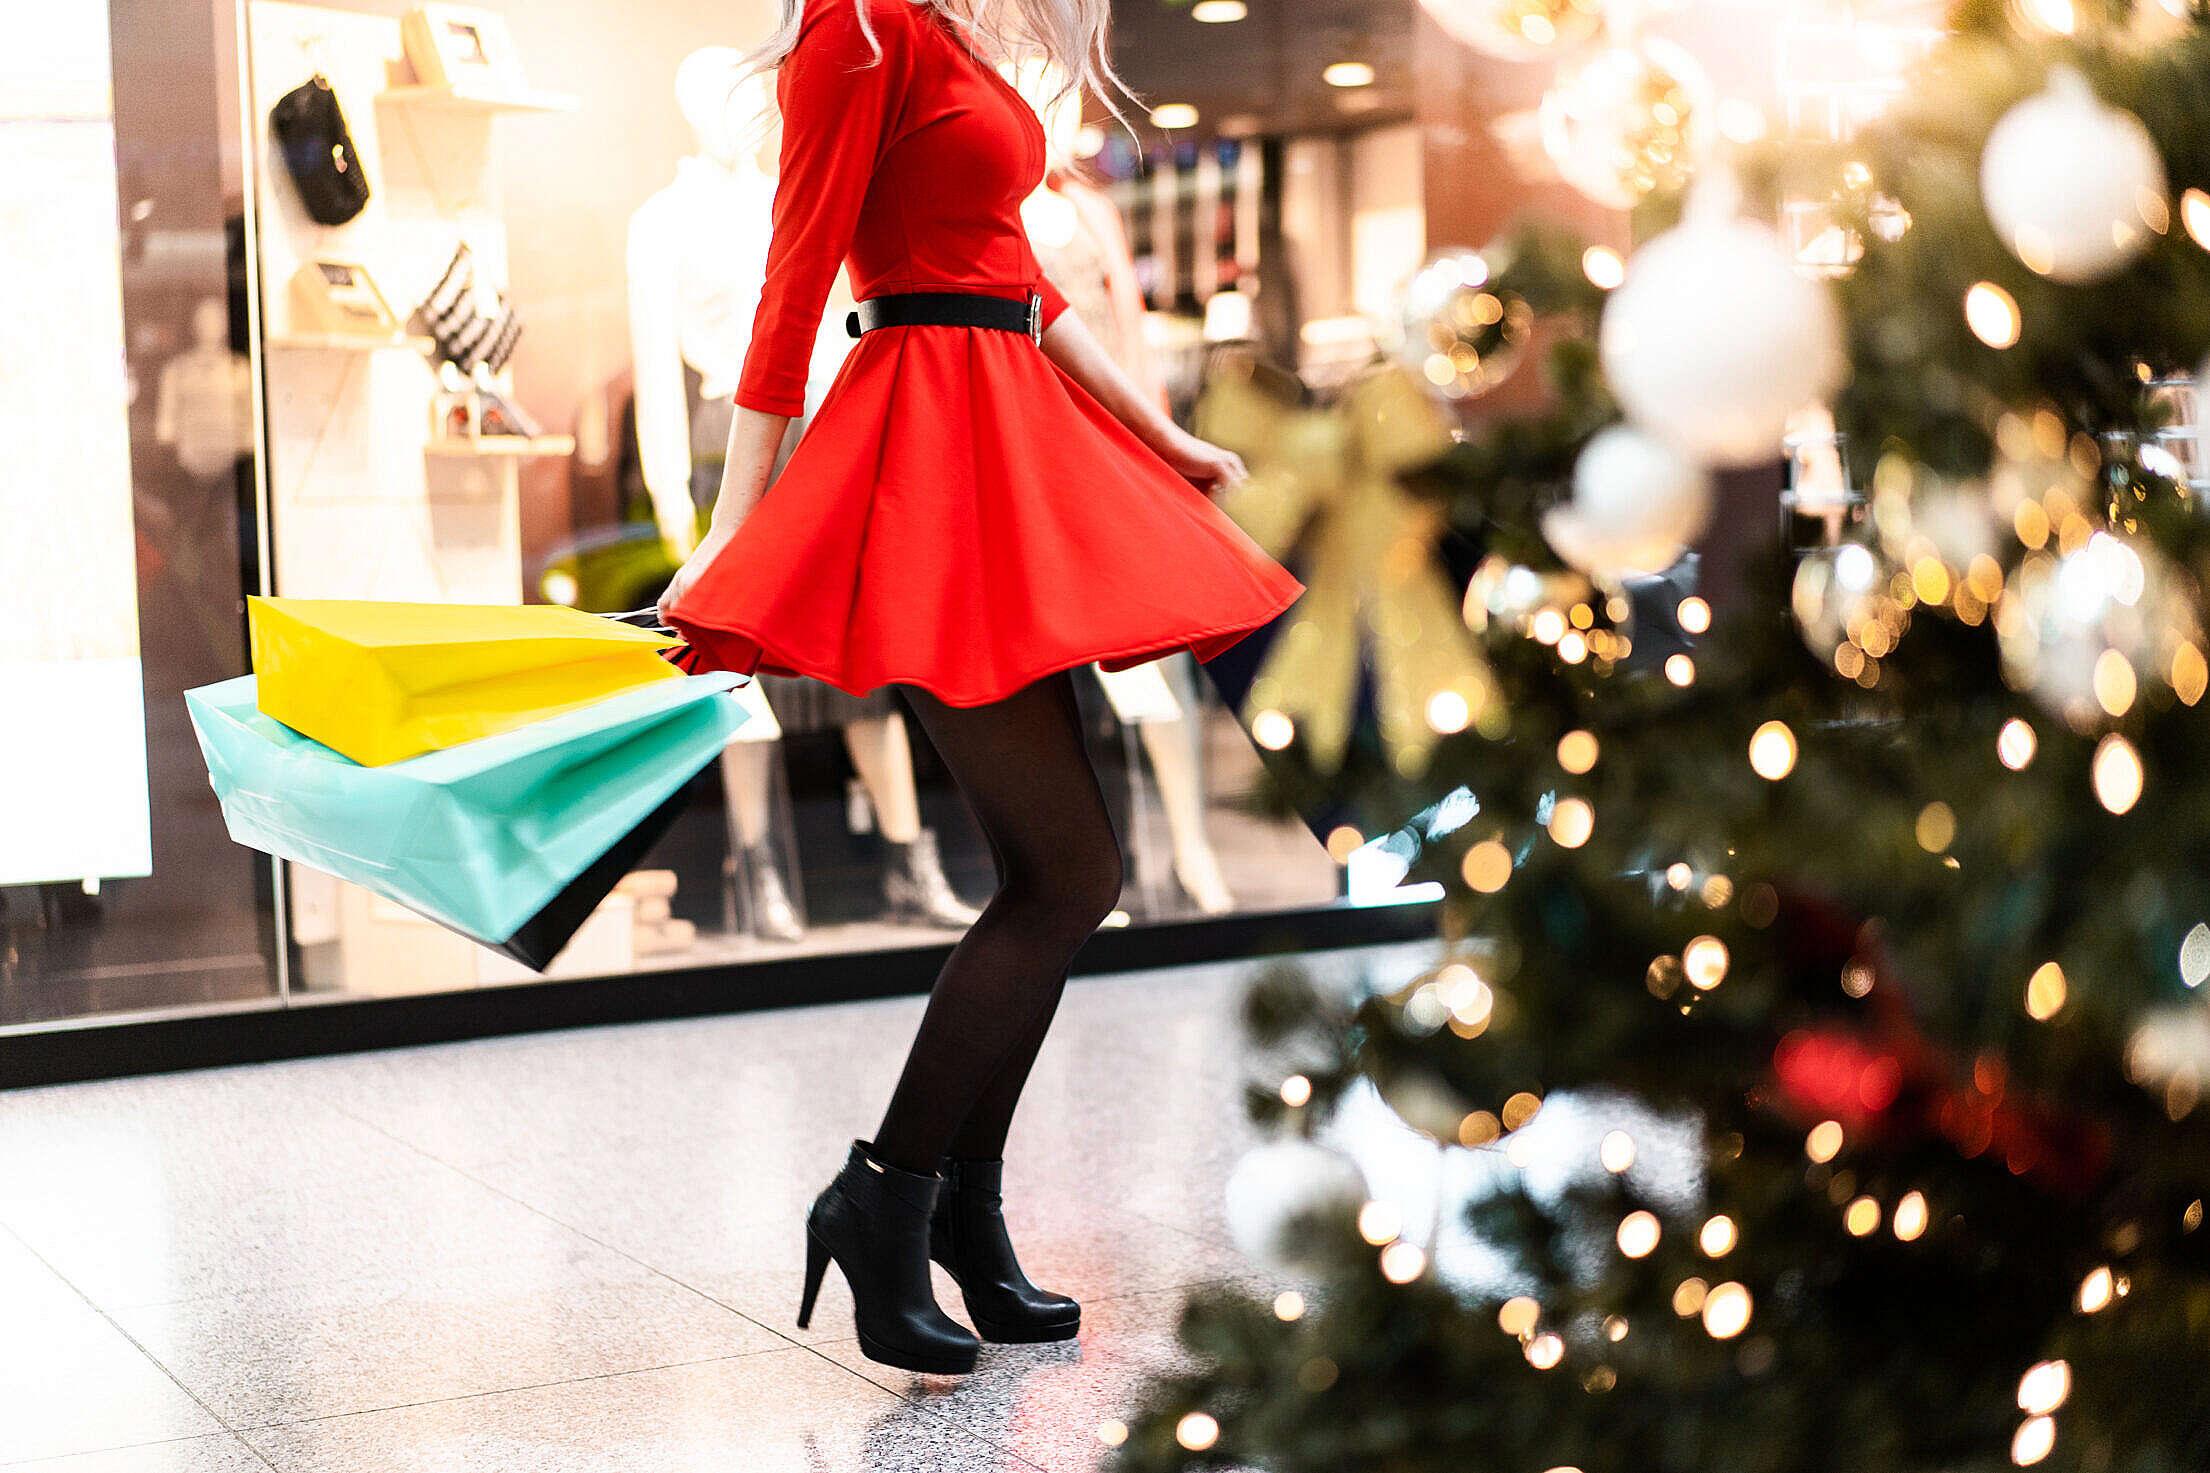 Woman in Red Dress Enjoying Christmas Shopping Free Stock Photo